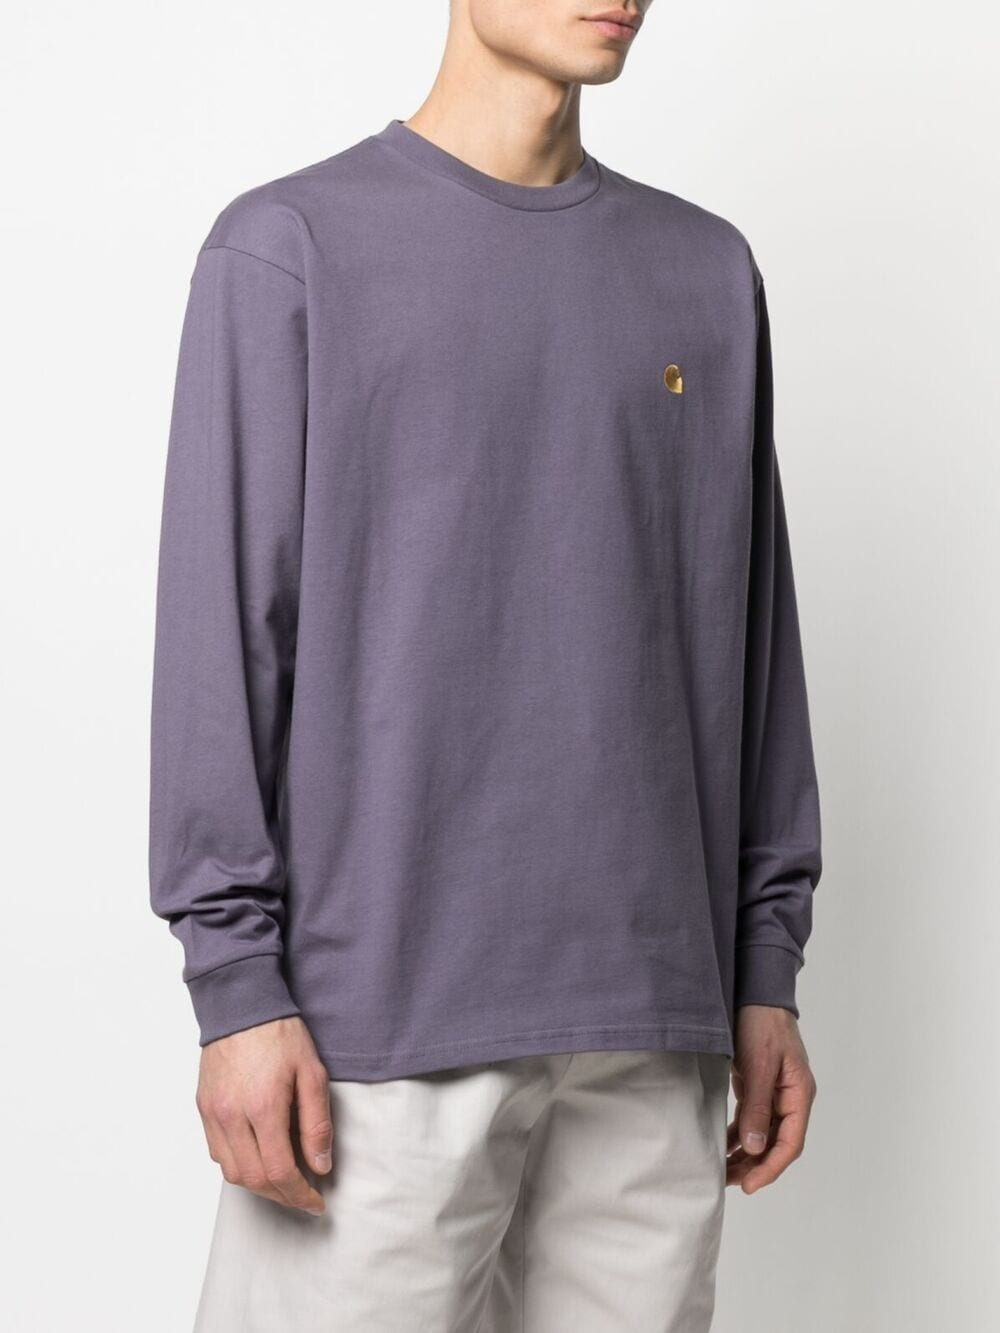 Carhartt t-shirt manica lunga chase uomo viola CARHARTT WIP | T-shirt | I026392.030AF.90